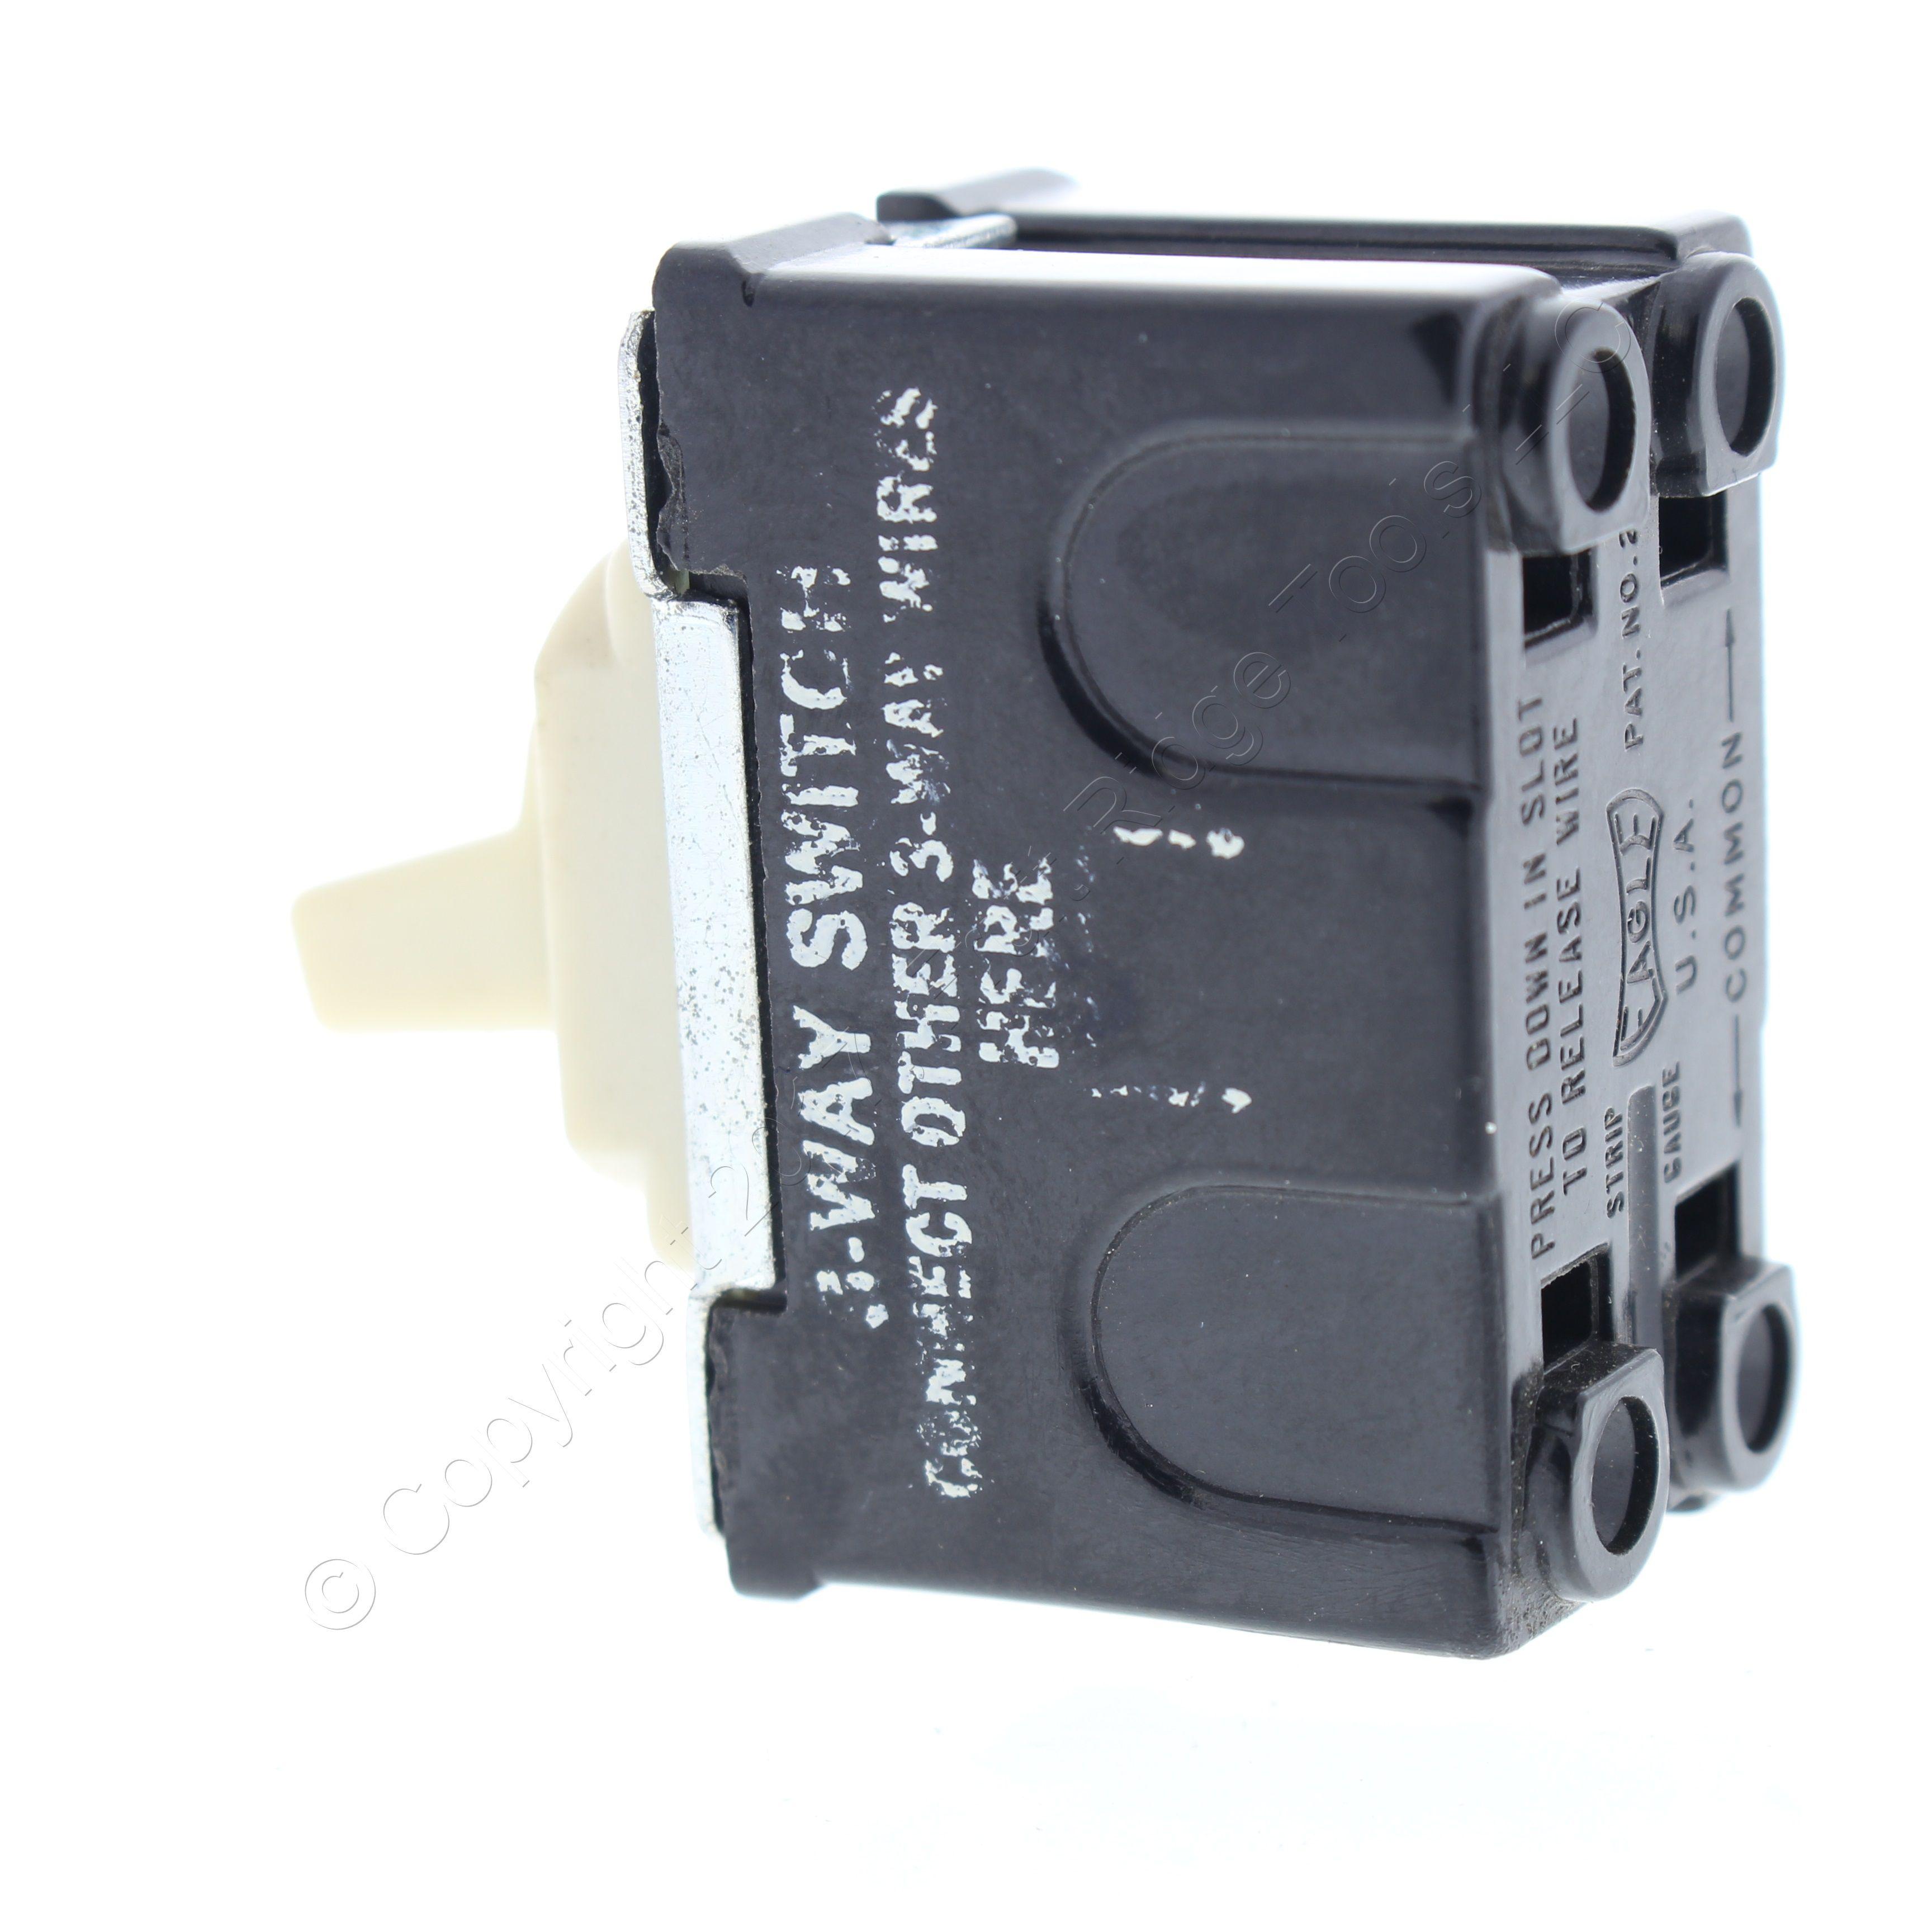 Shop Eagle Ivory 3 Way Interchange Toggle Switch For Despard No Common Plate 15a Bulk 1103v Fruit Ridge Tools